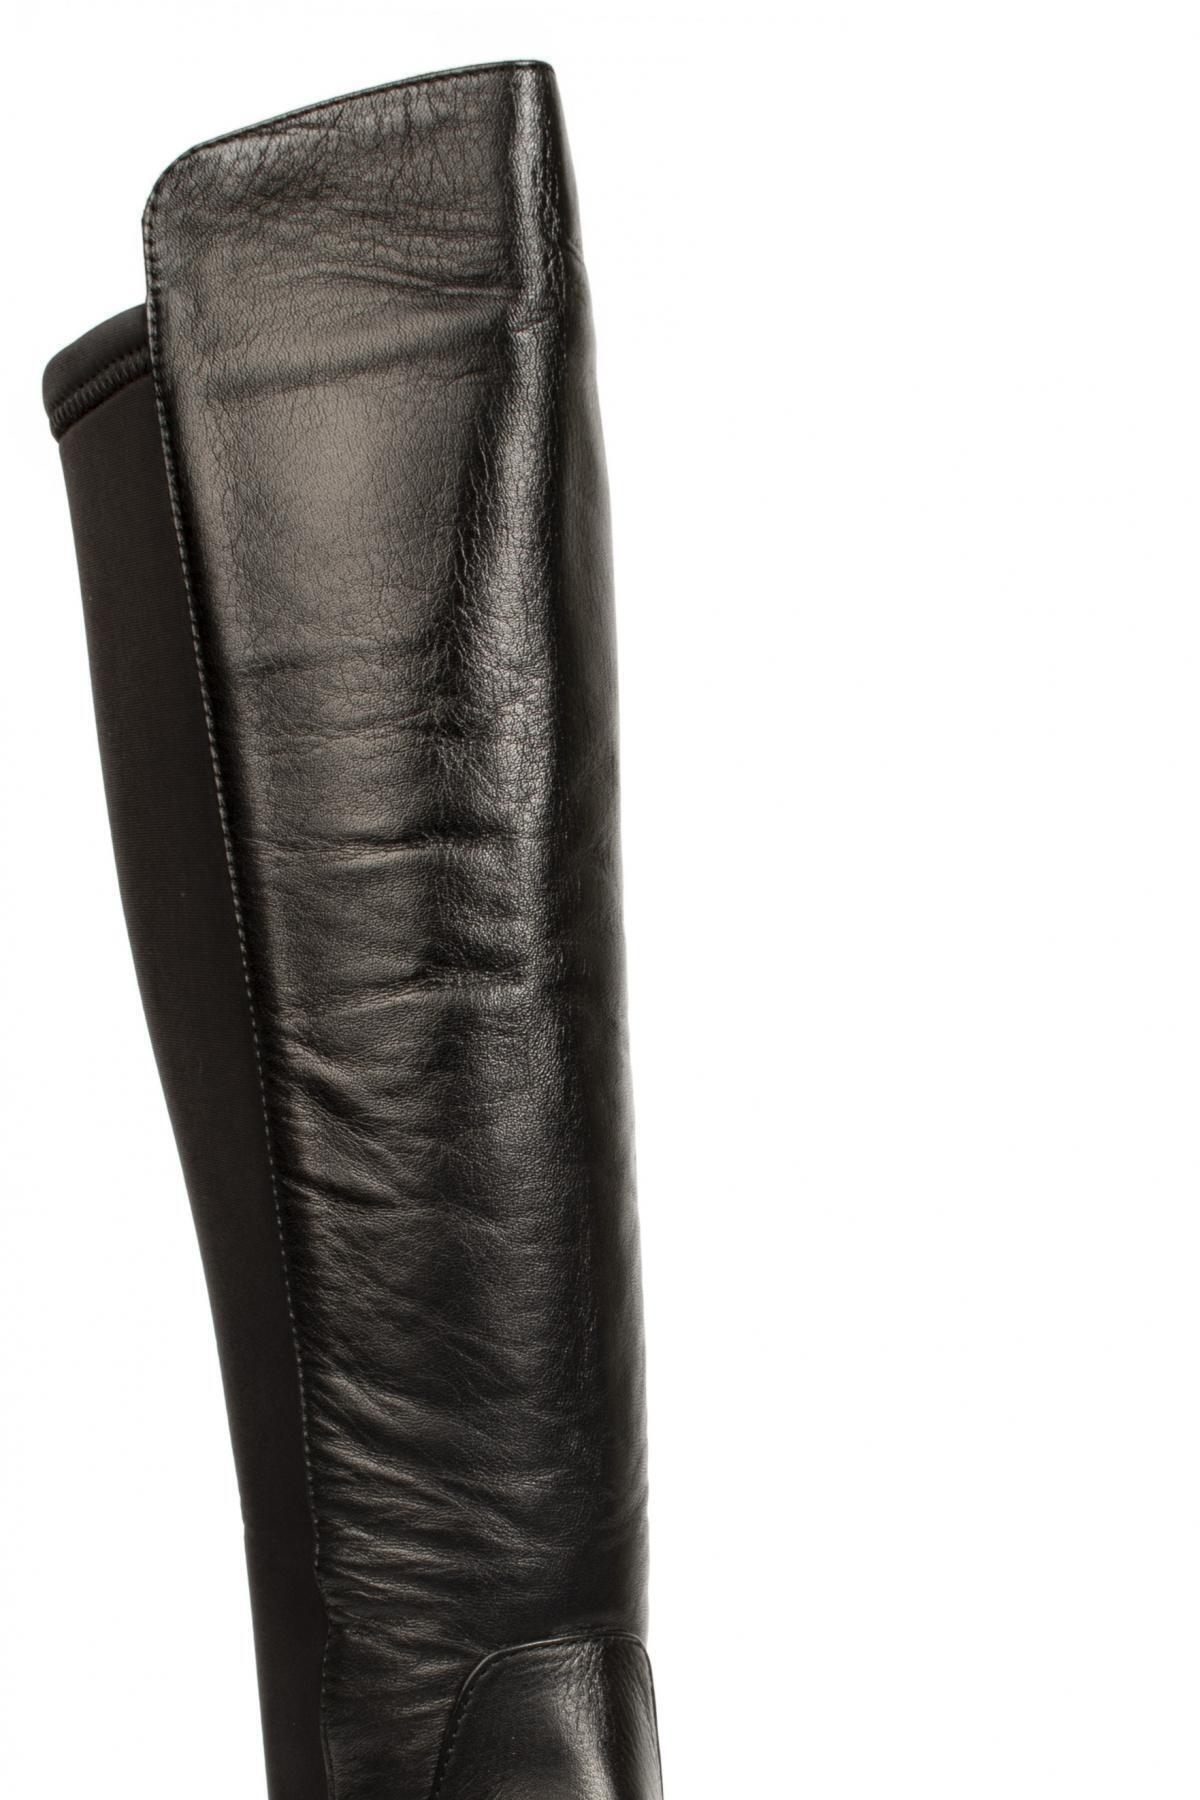 Mammamia Kadın Siyah Deri Çizme D20kc-2040 2